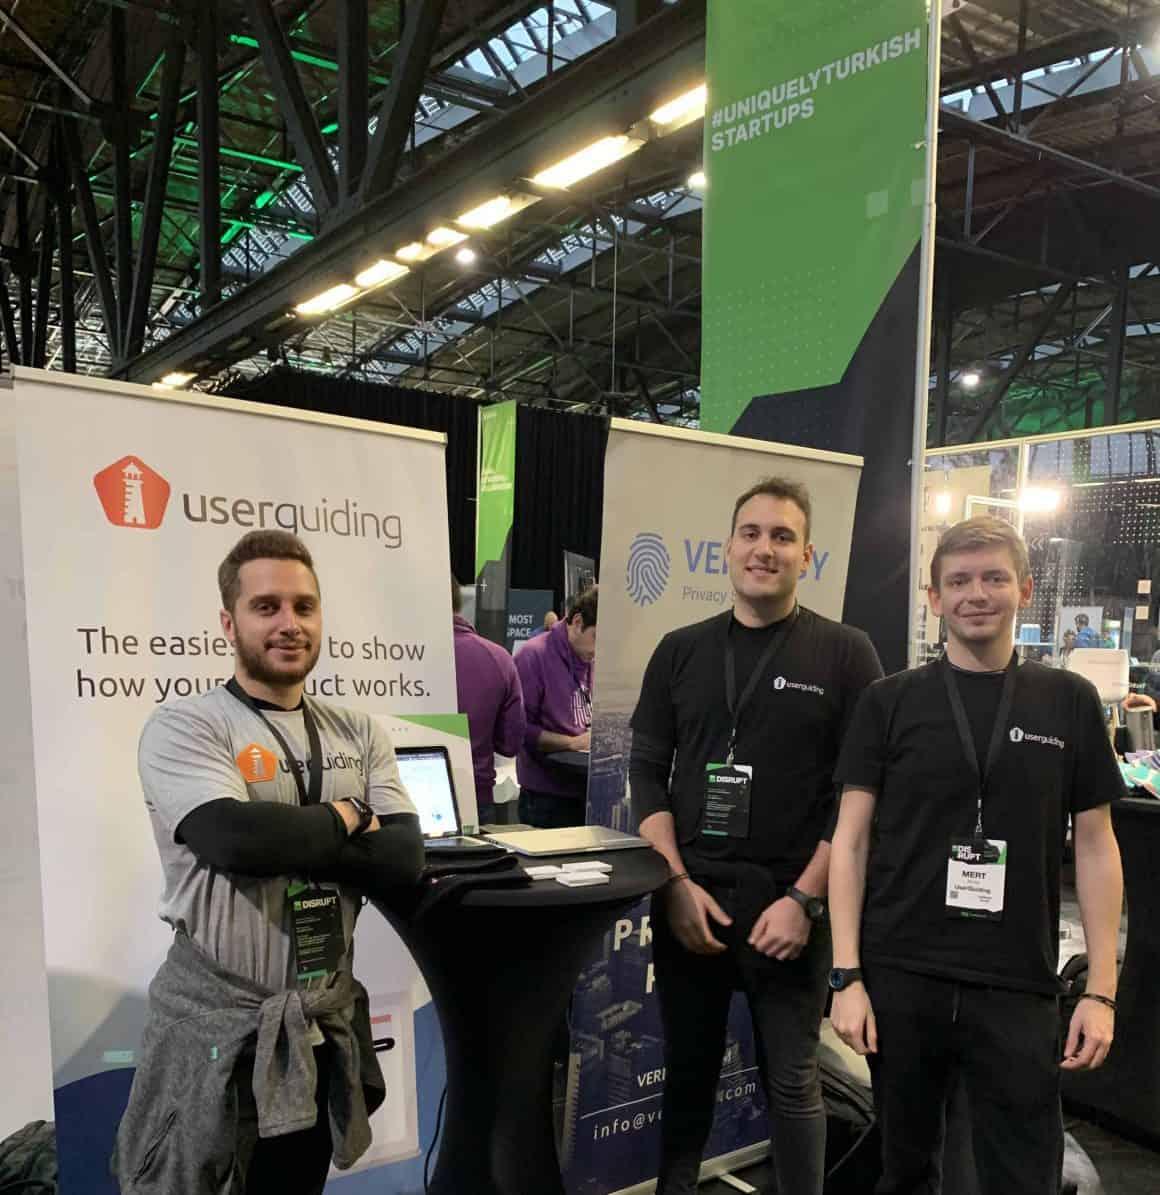 Team UserGuiding at TechCrunch Disrupt Berlin 2019